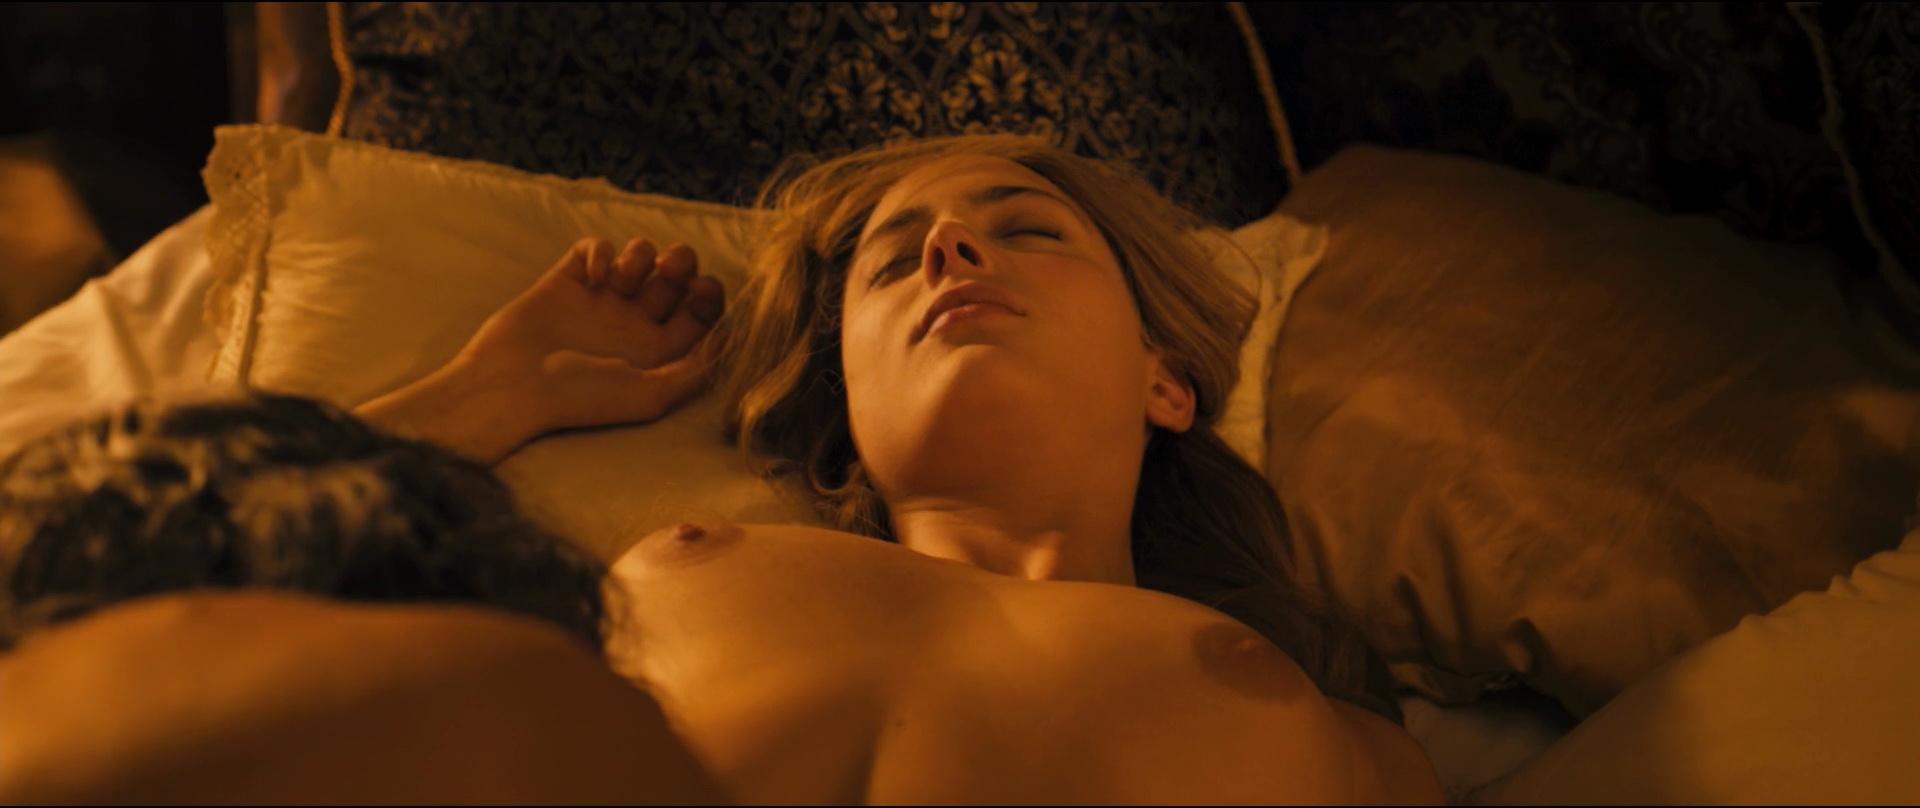 Nora tschirner sex scene